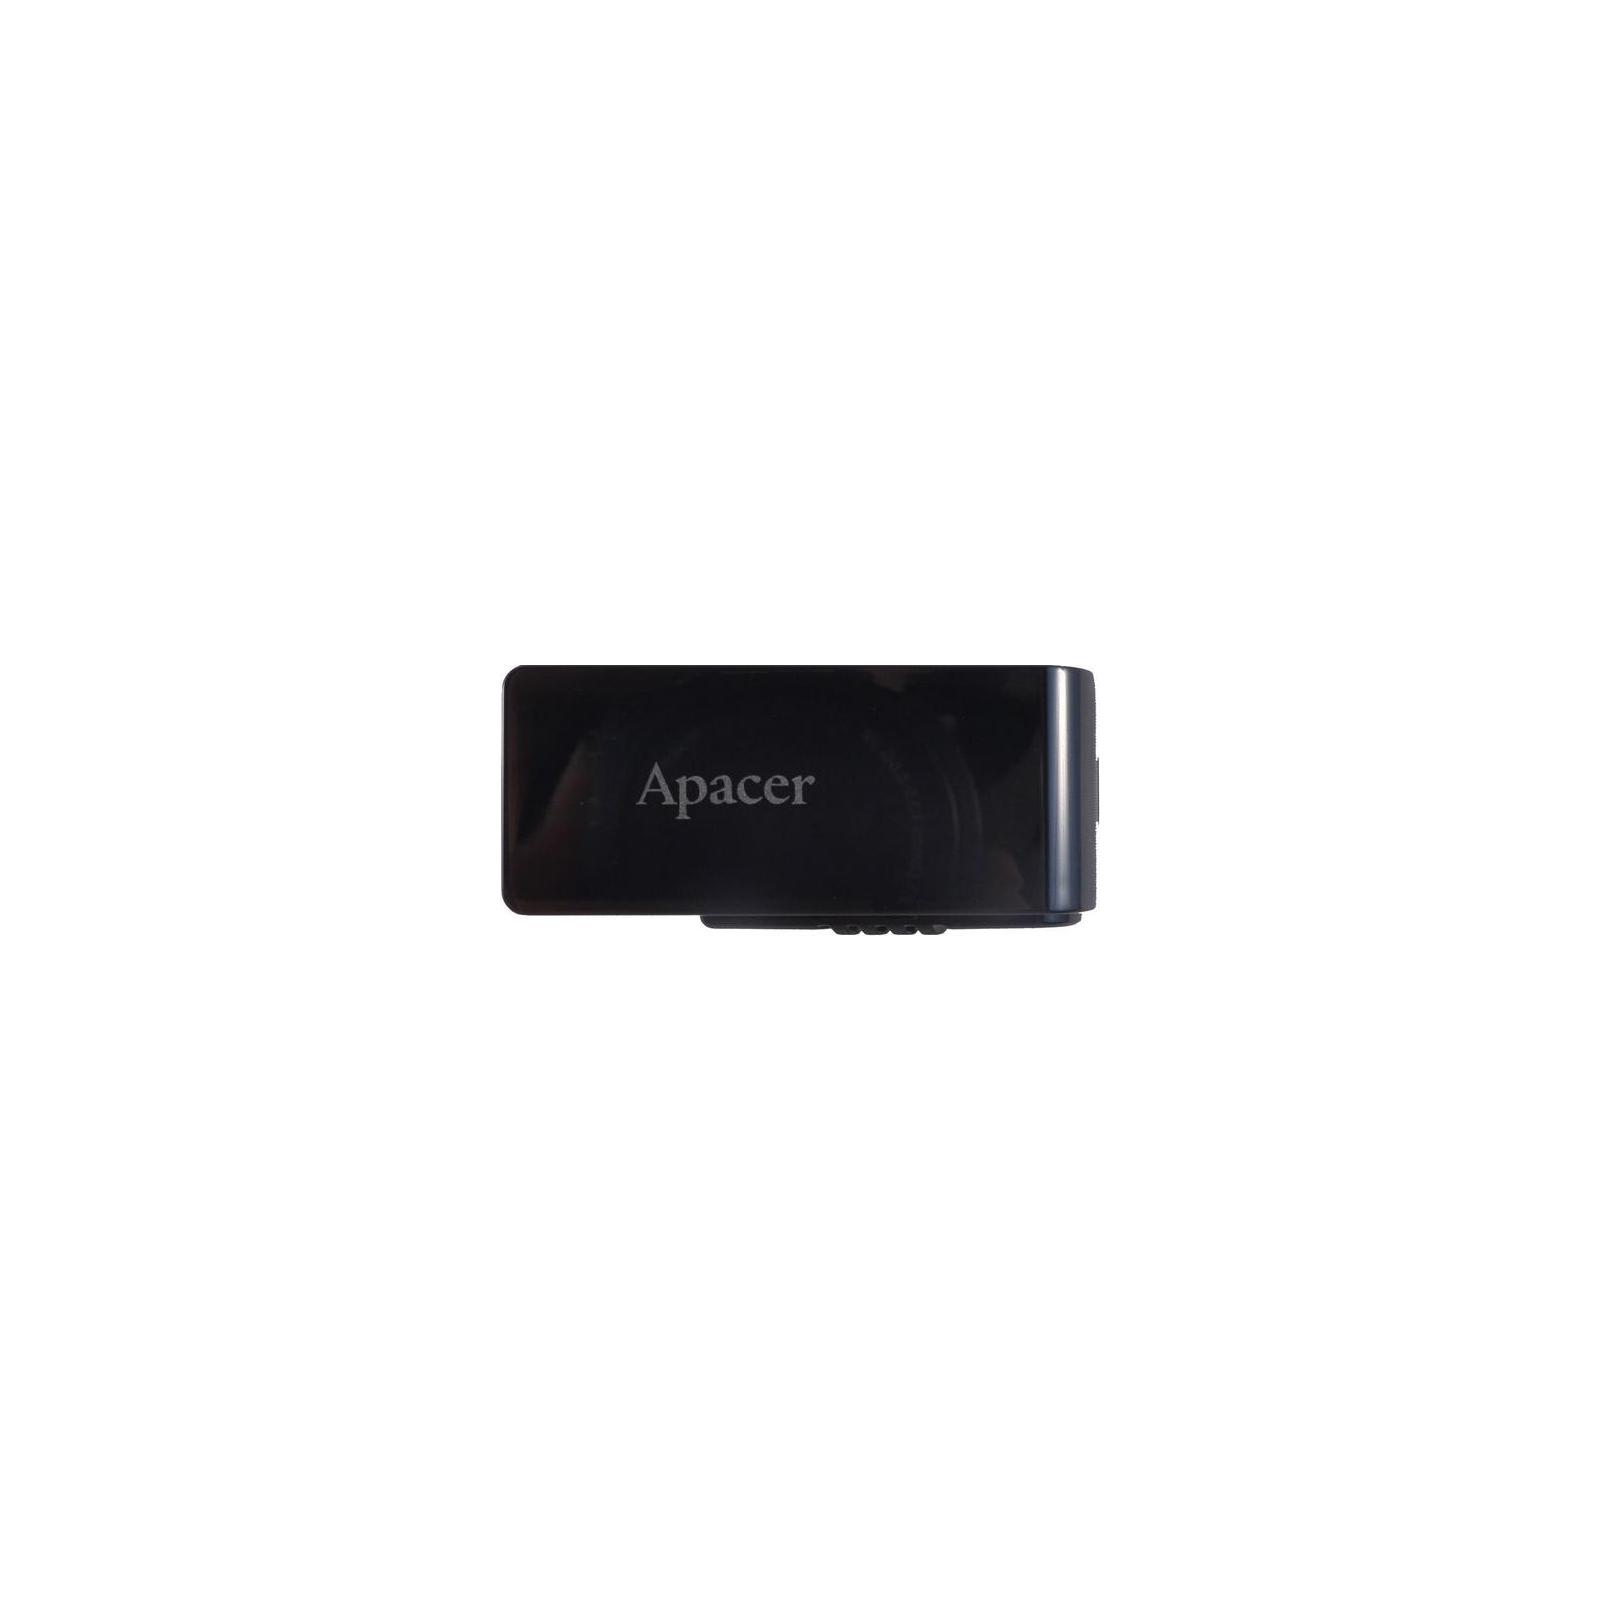 USB флеш накопитель 128GB AH350 Black RP USB3.0 Apacer (AP128GAH350B-1)